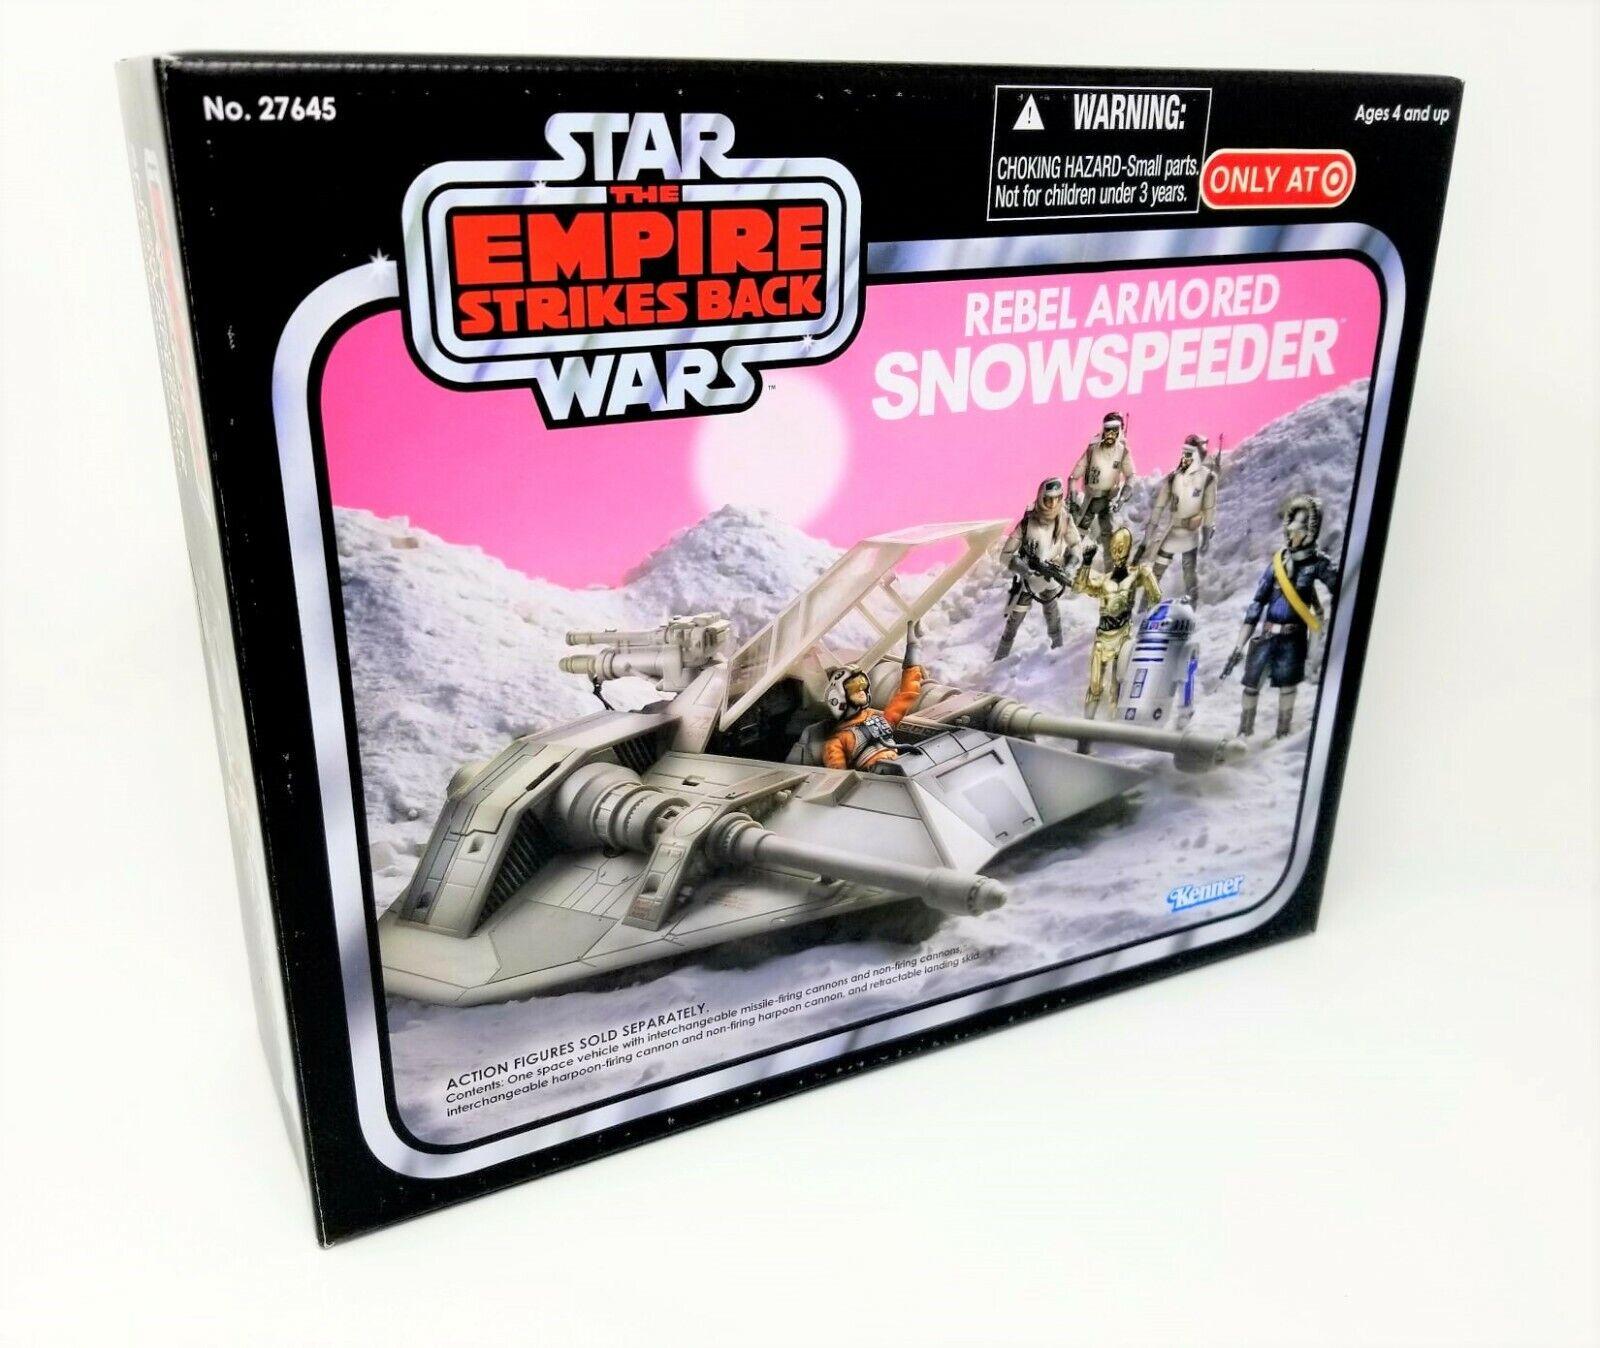 Star Wars Empire Strikes Back Rebel Armored Snowspeeder Target Exclusive MIB